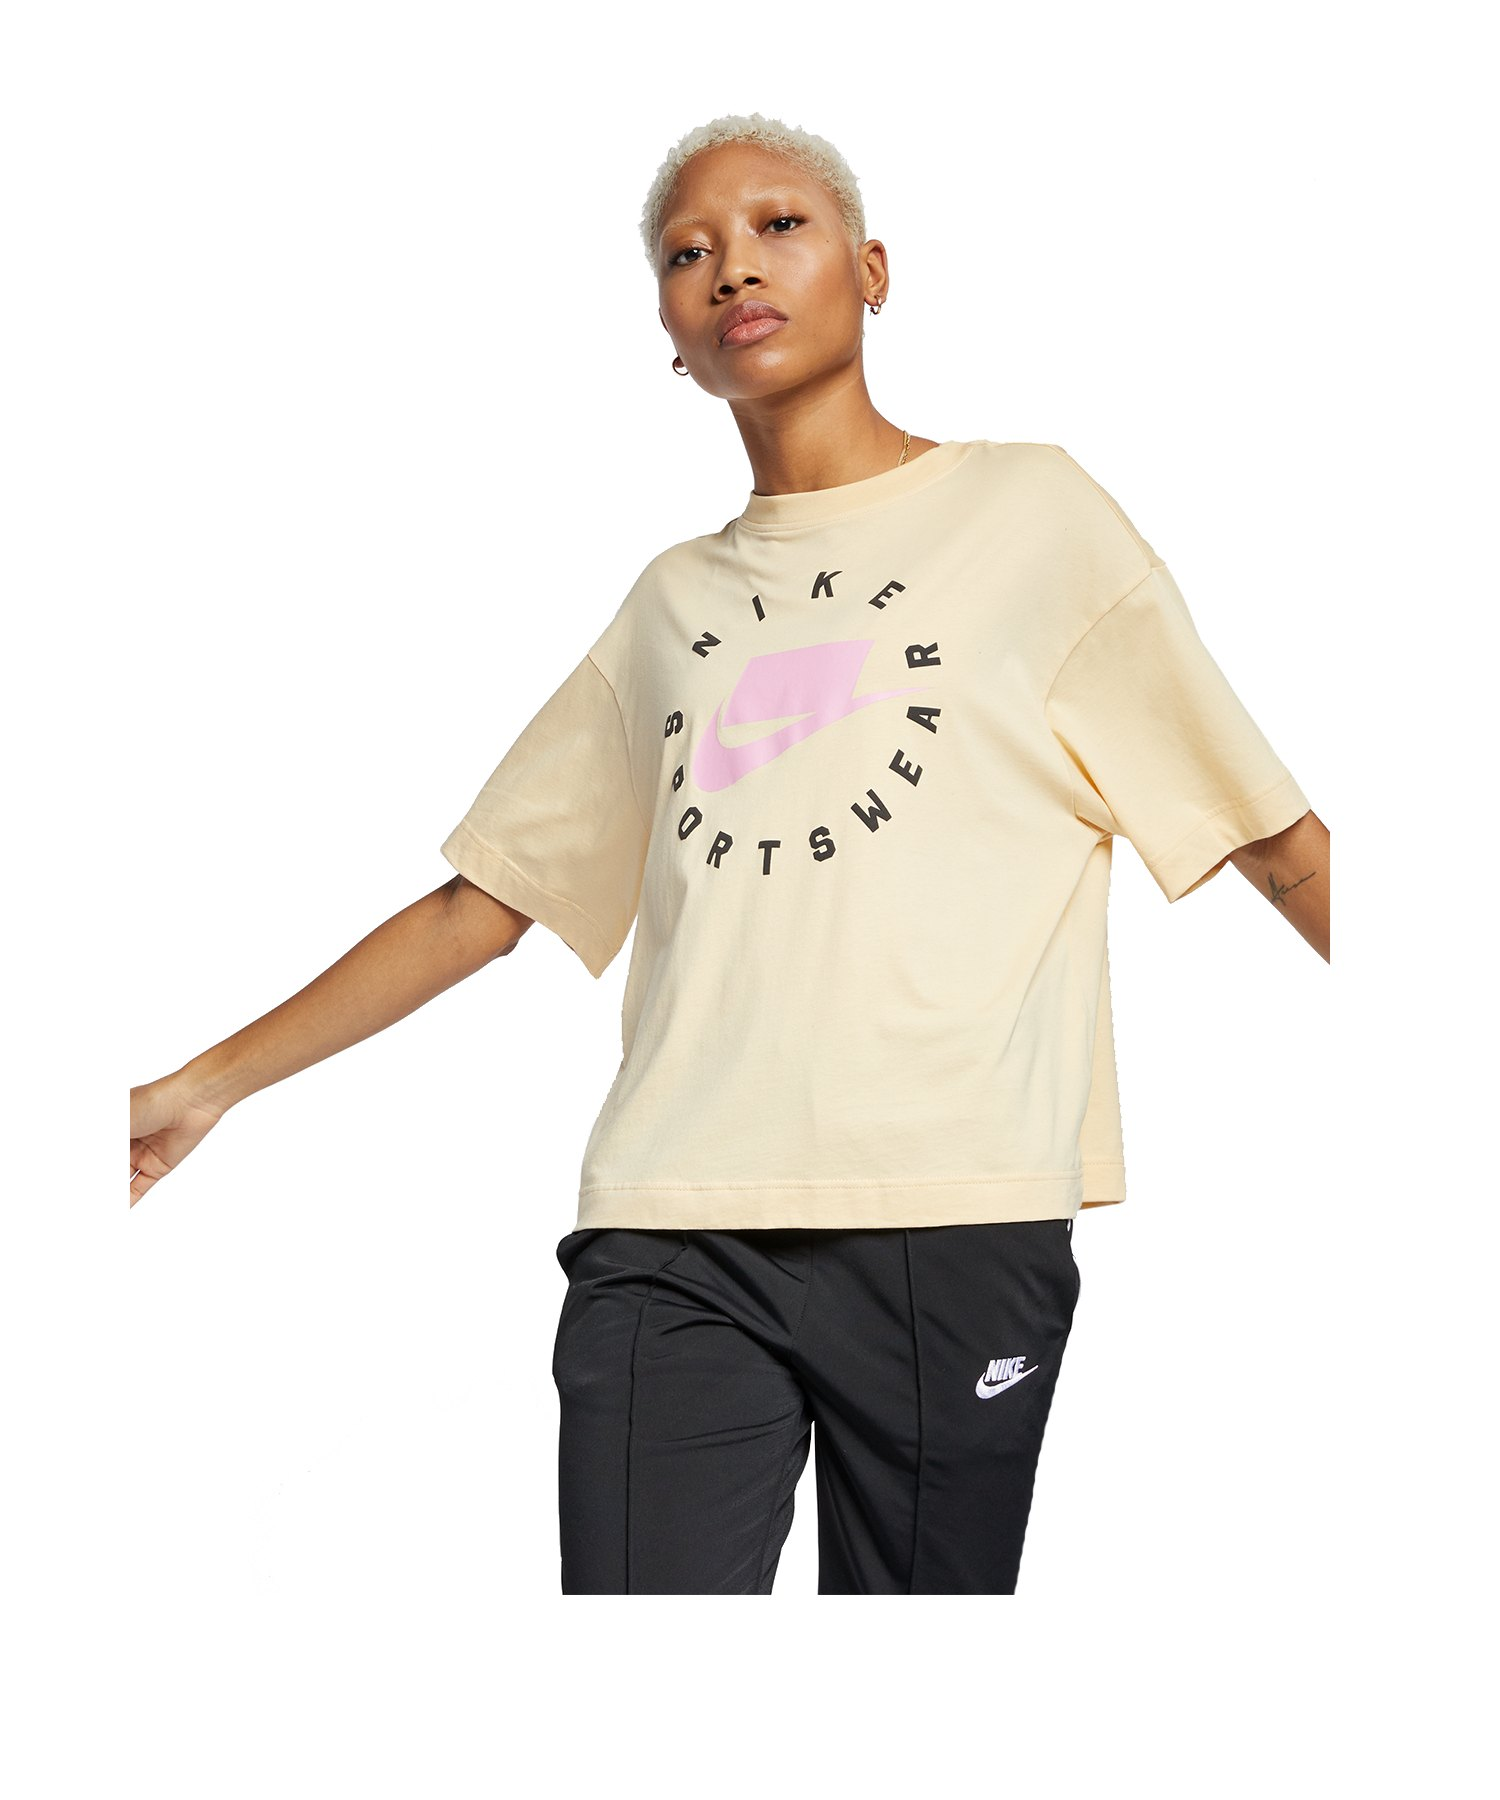 Nike Tee T-Shirt Hellgelb F294 - gelb